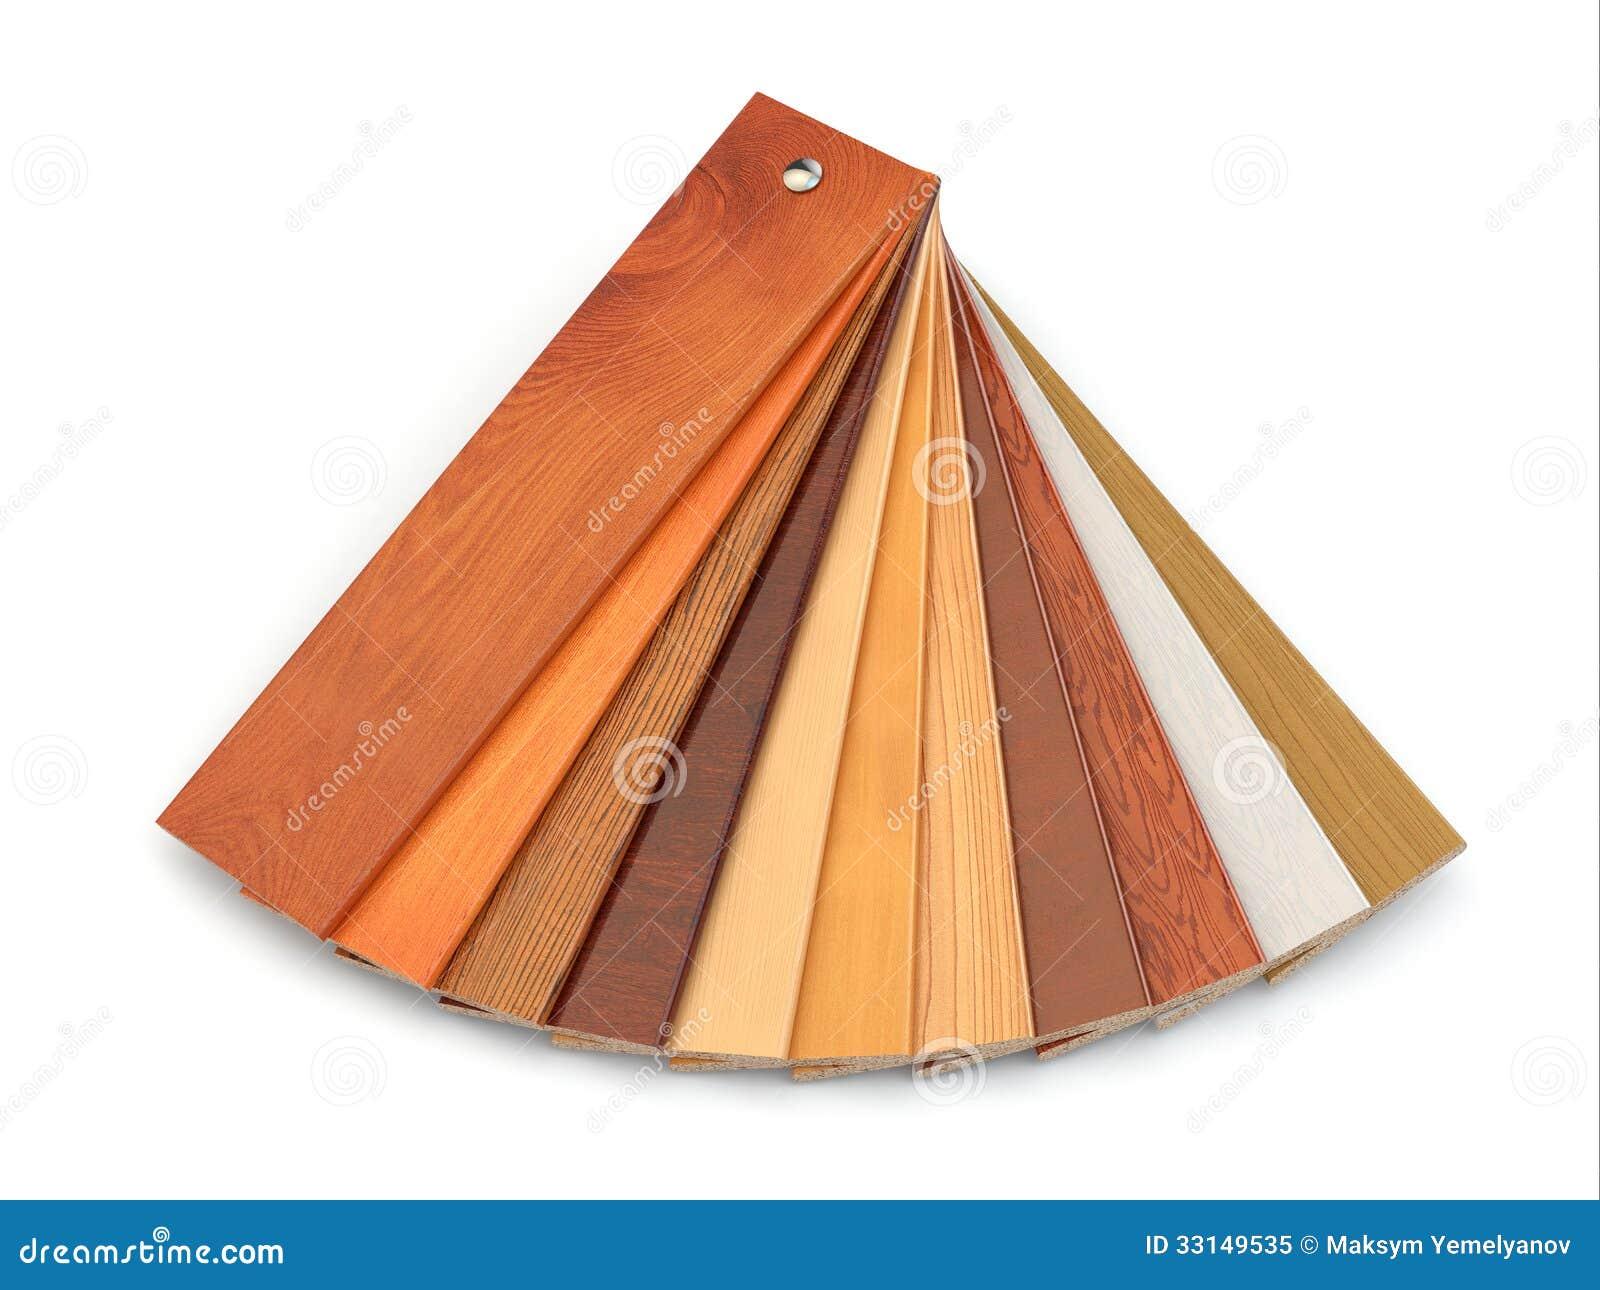 Flooring laminate or parqet samples stock illustration for Laminate wood flooring samples